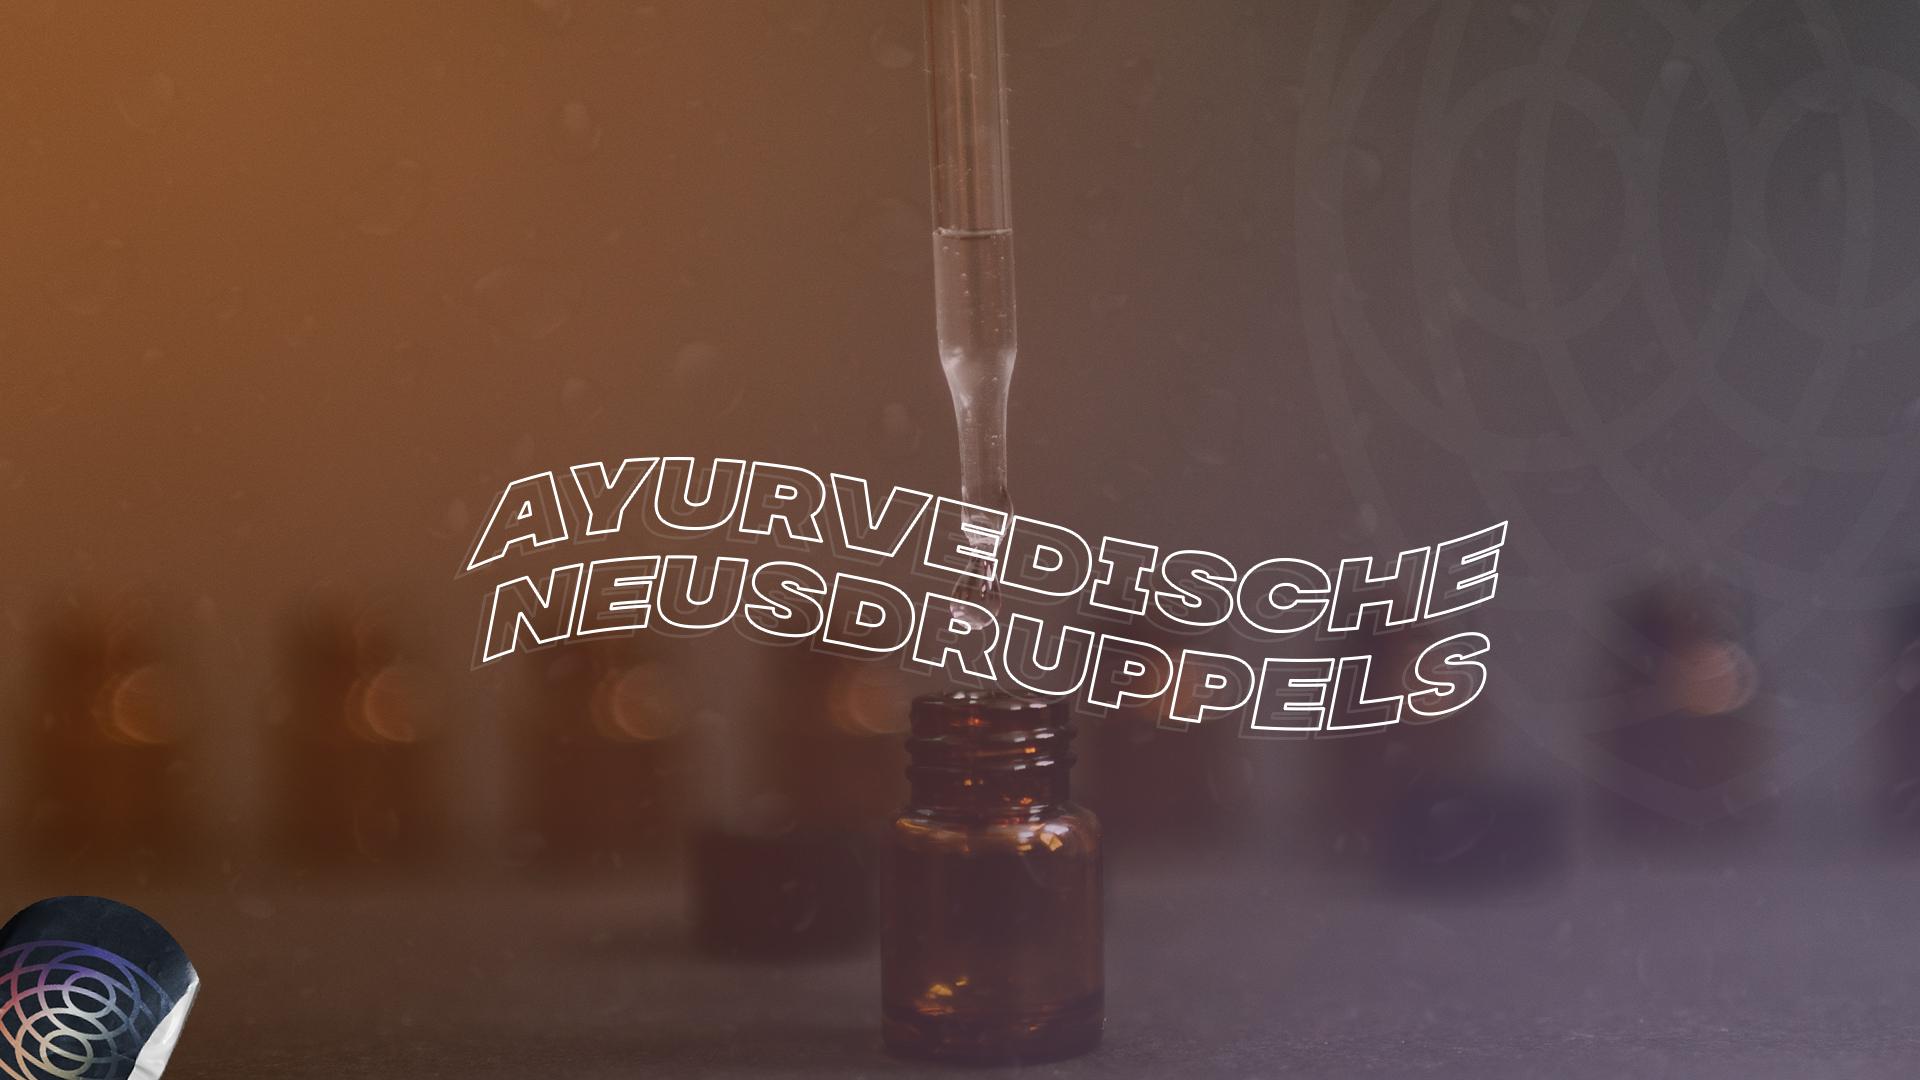 Ayurveda Neusdruppels